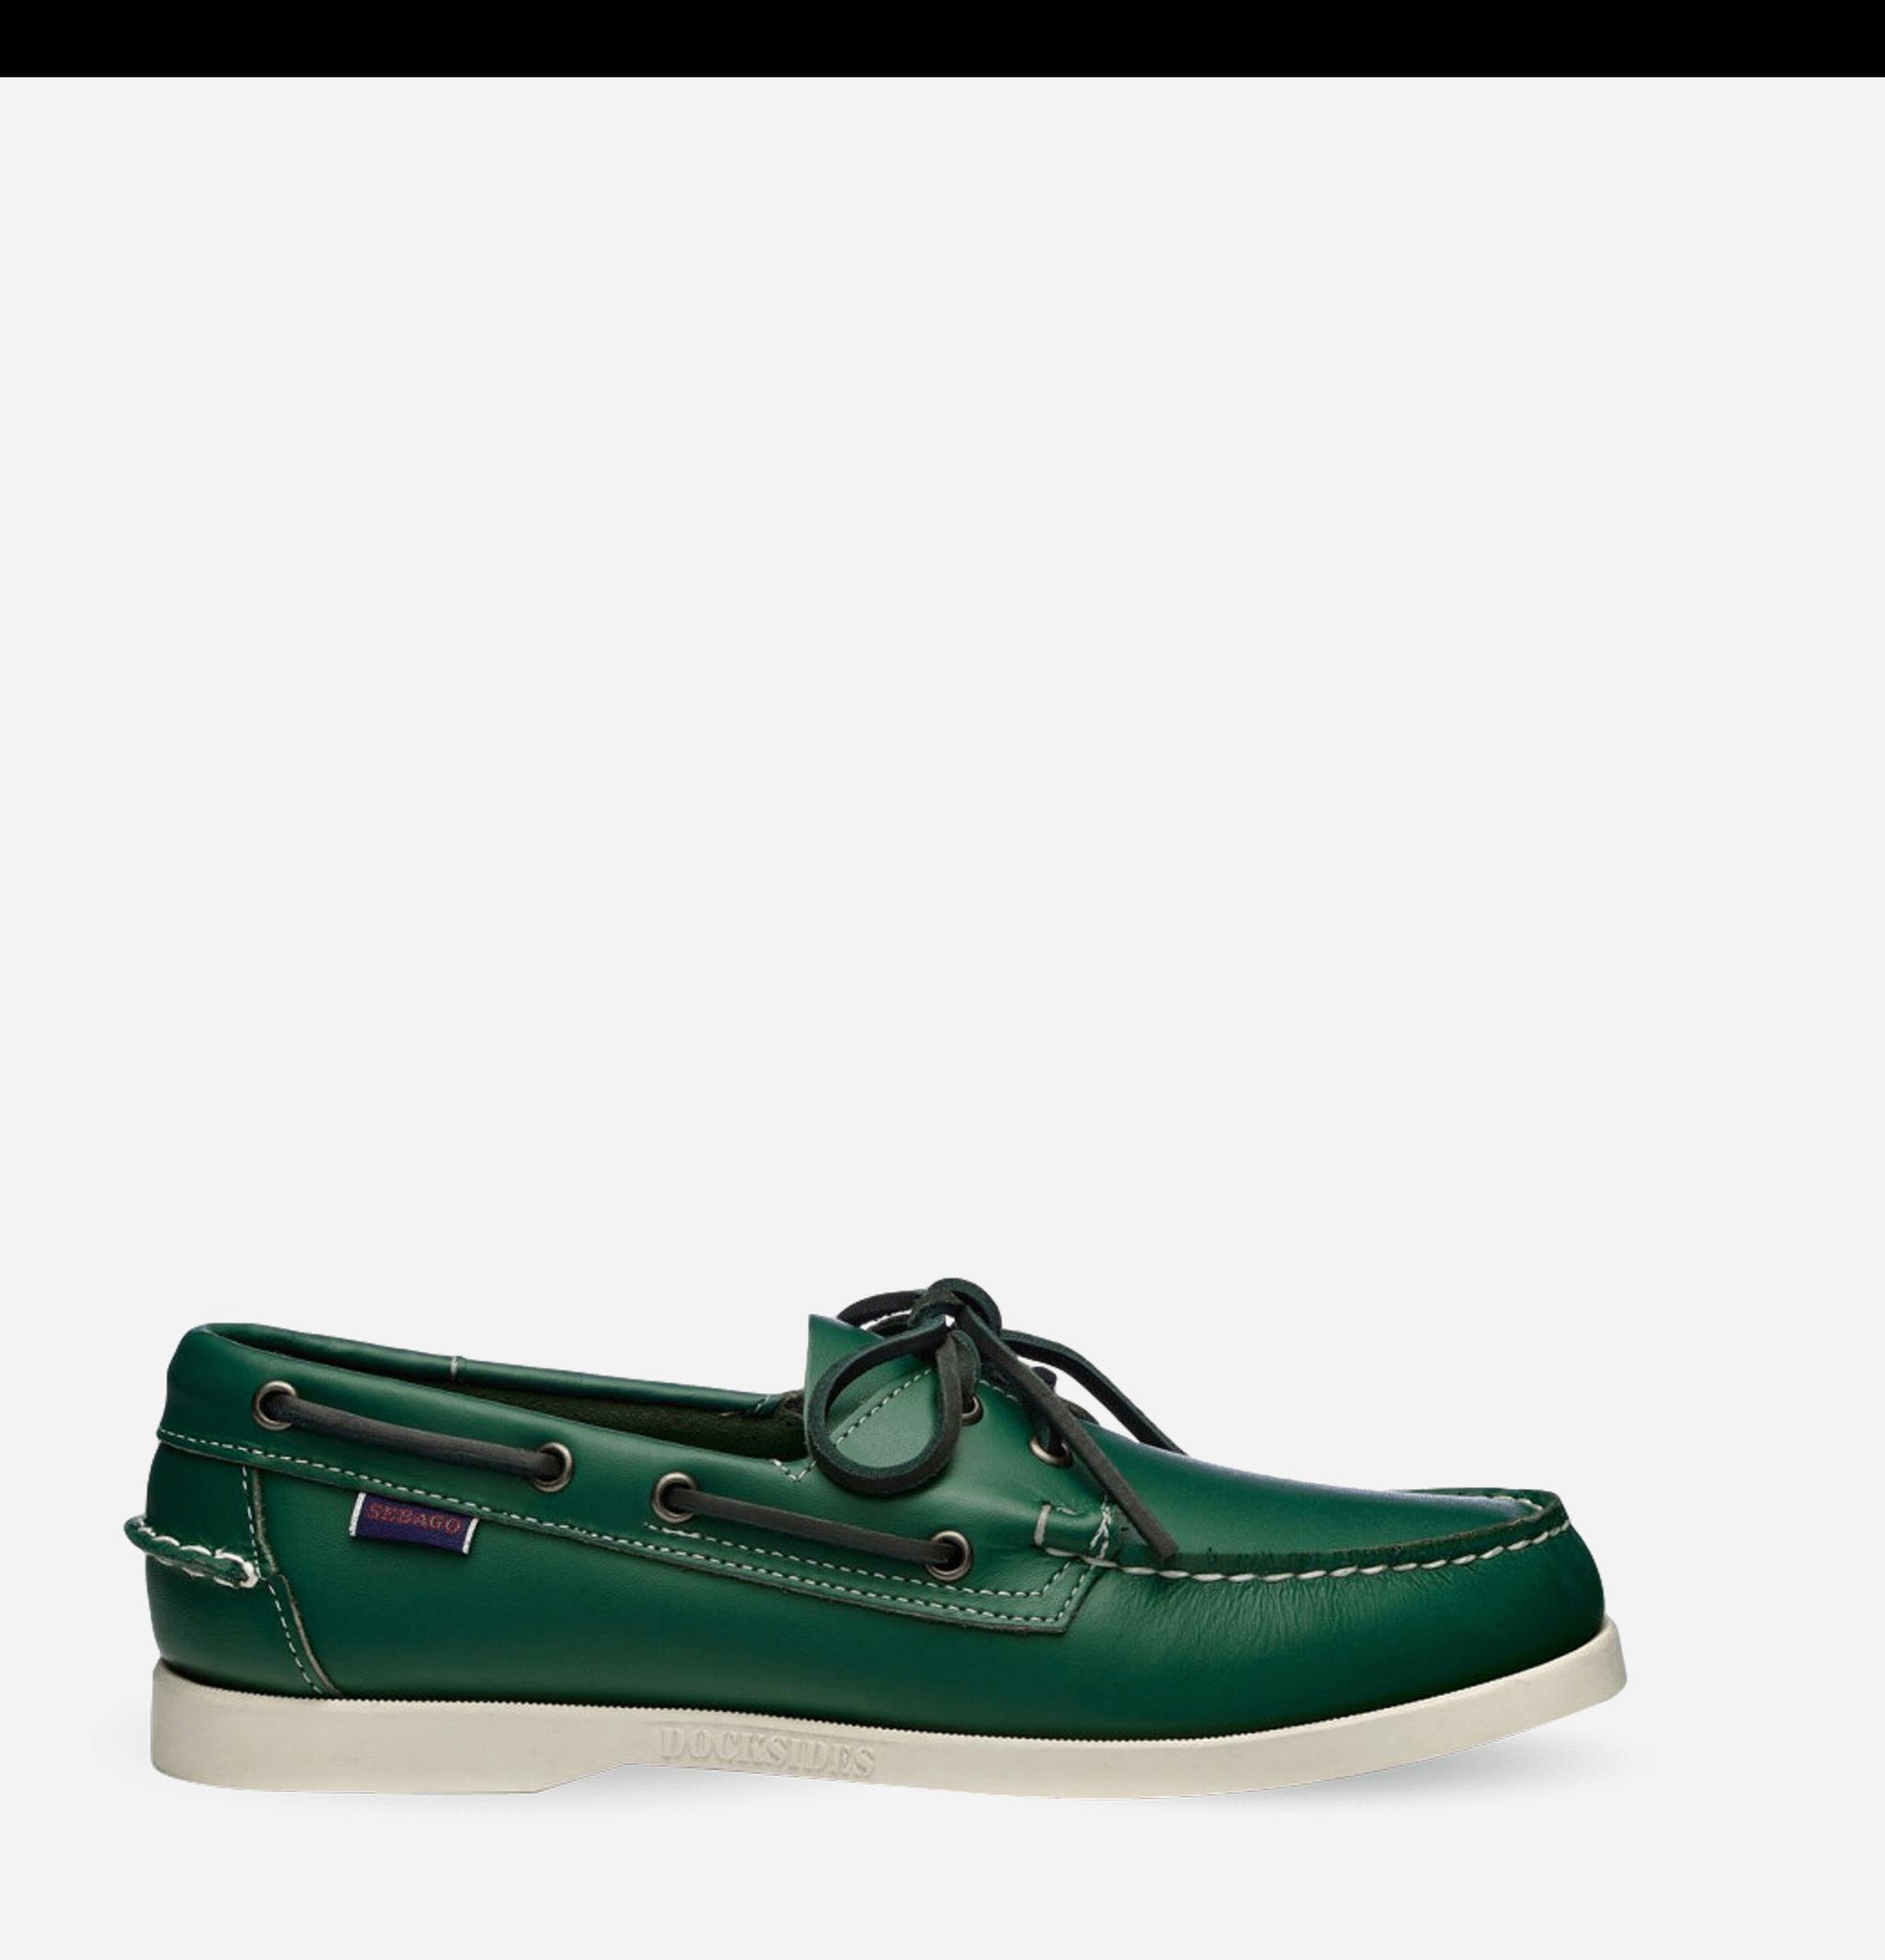 Sebago Shoes Docksides Green